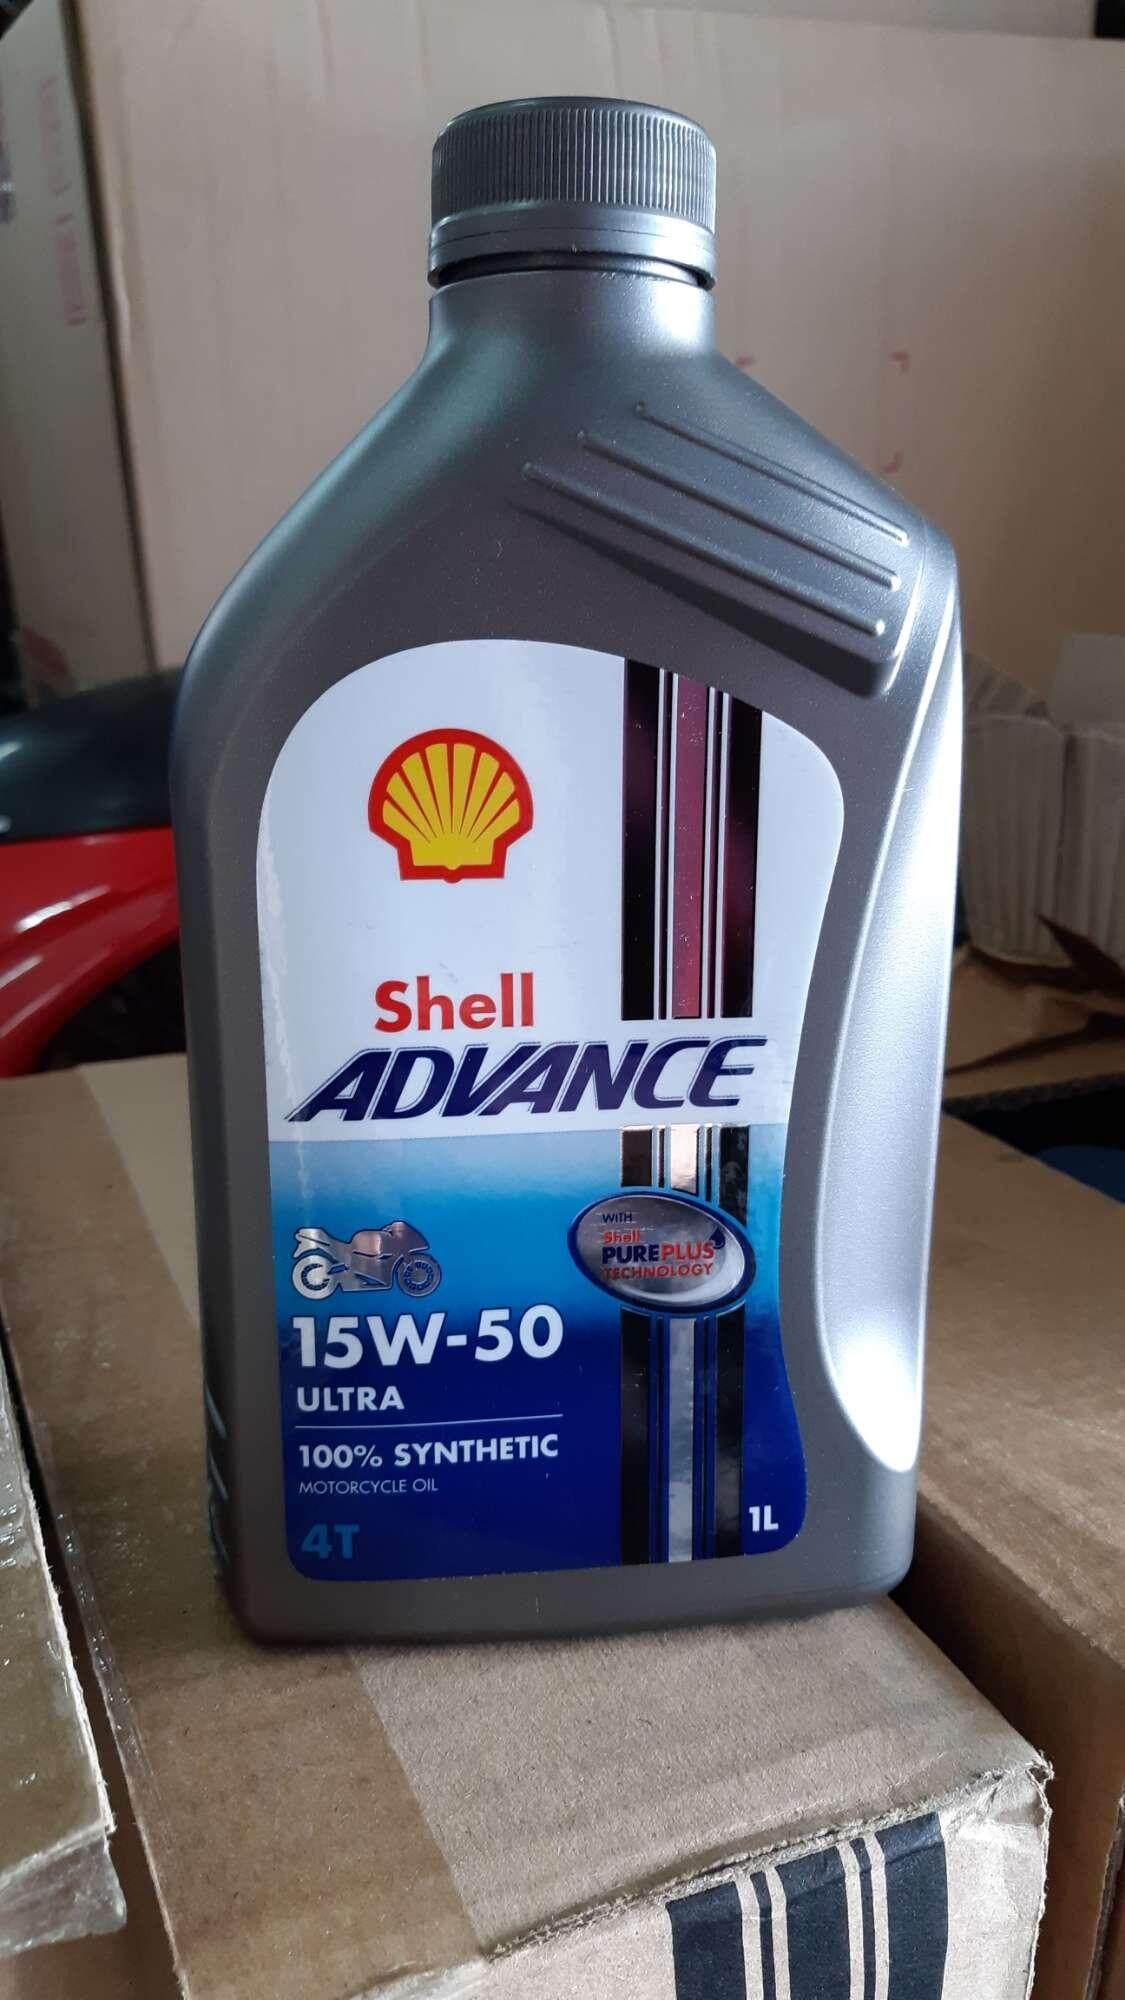 Shell Advance 4T Ultra 15W/50